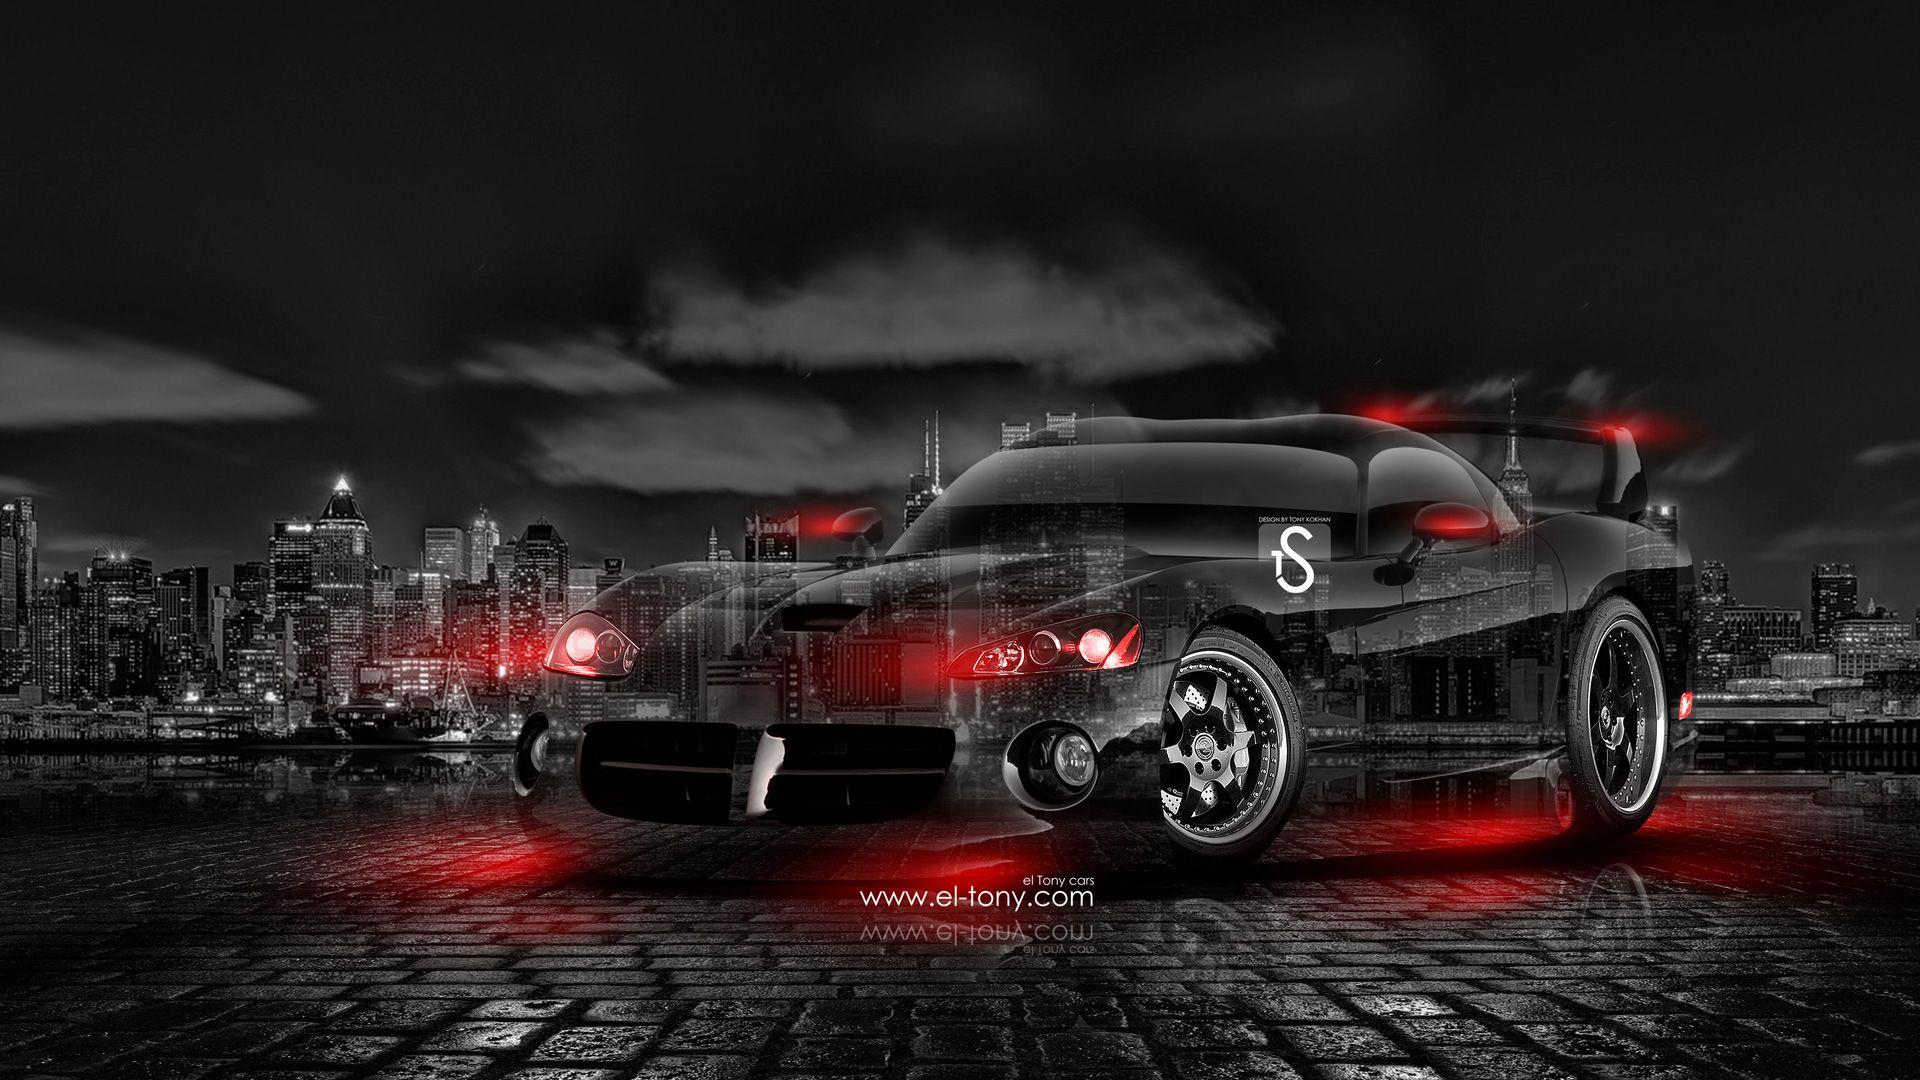 Charmant Dodge Viper Crystal City Car 2014 Orange Neon